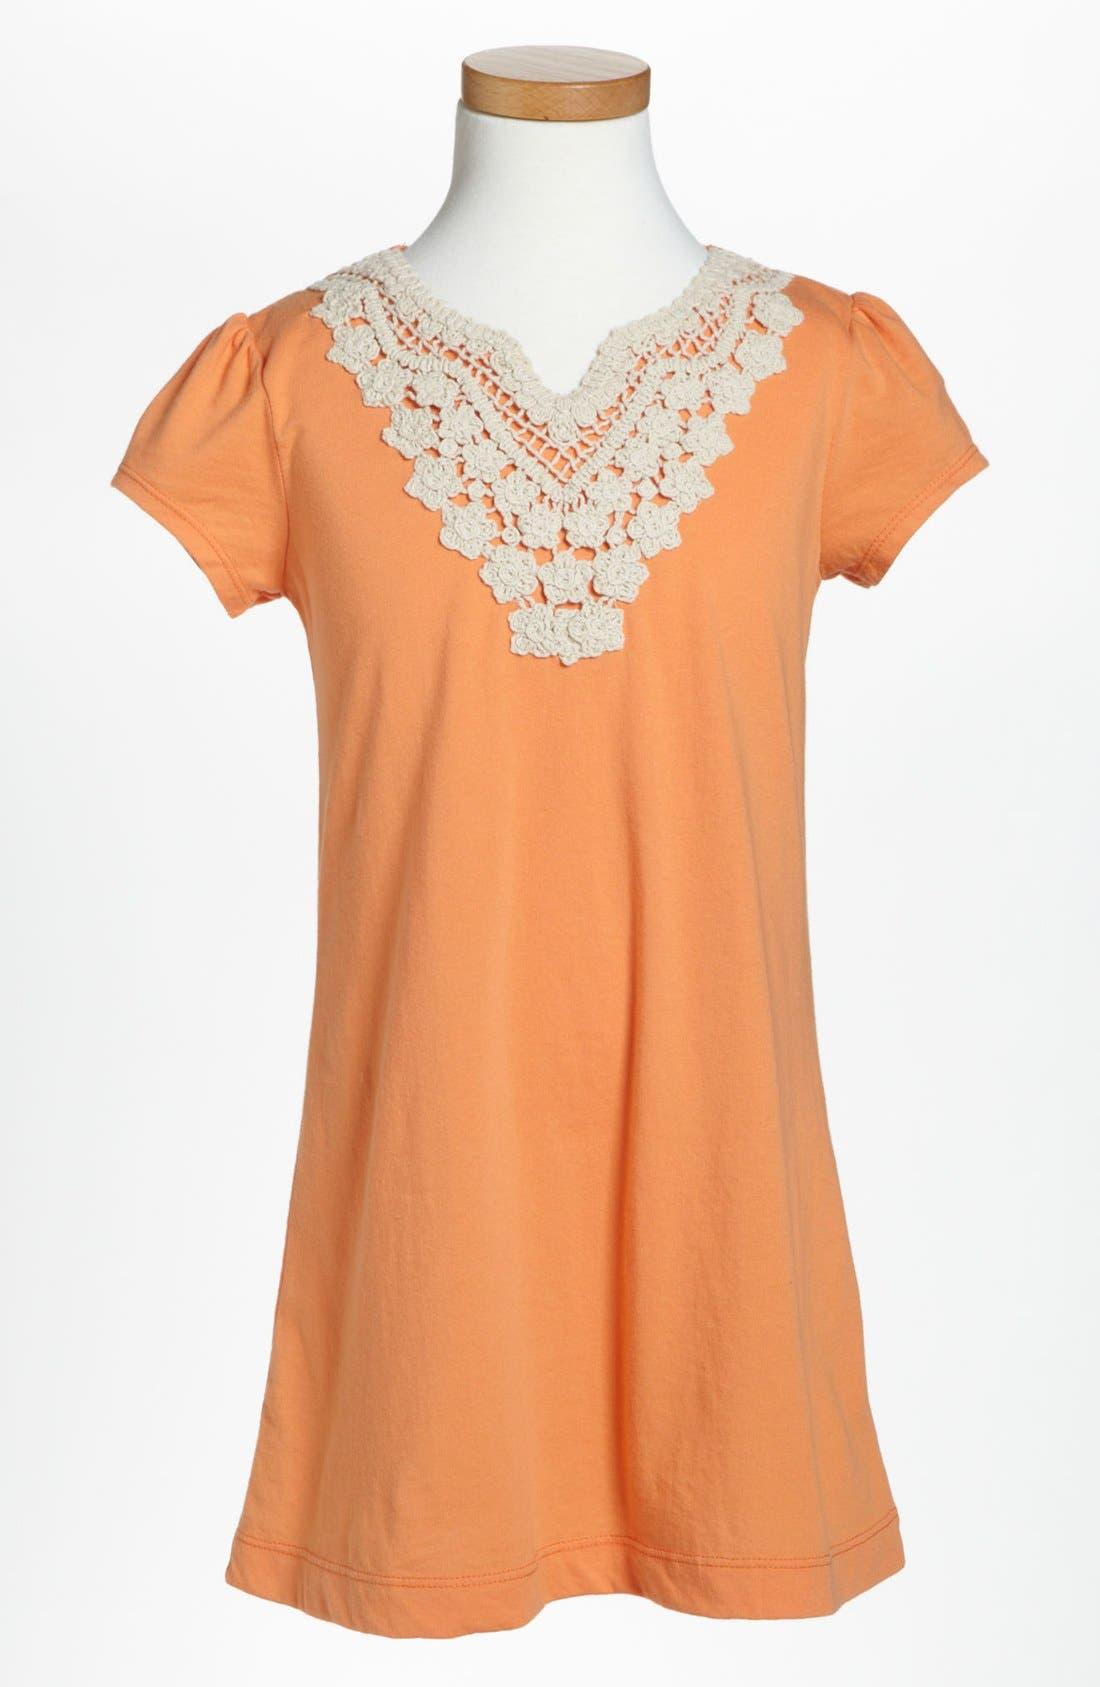 Alternate Image 1 Selected - Tucker + Tate 'Bali' Knit Dress (Little Girls)